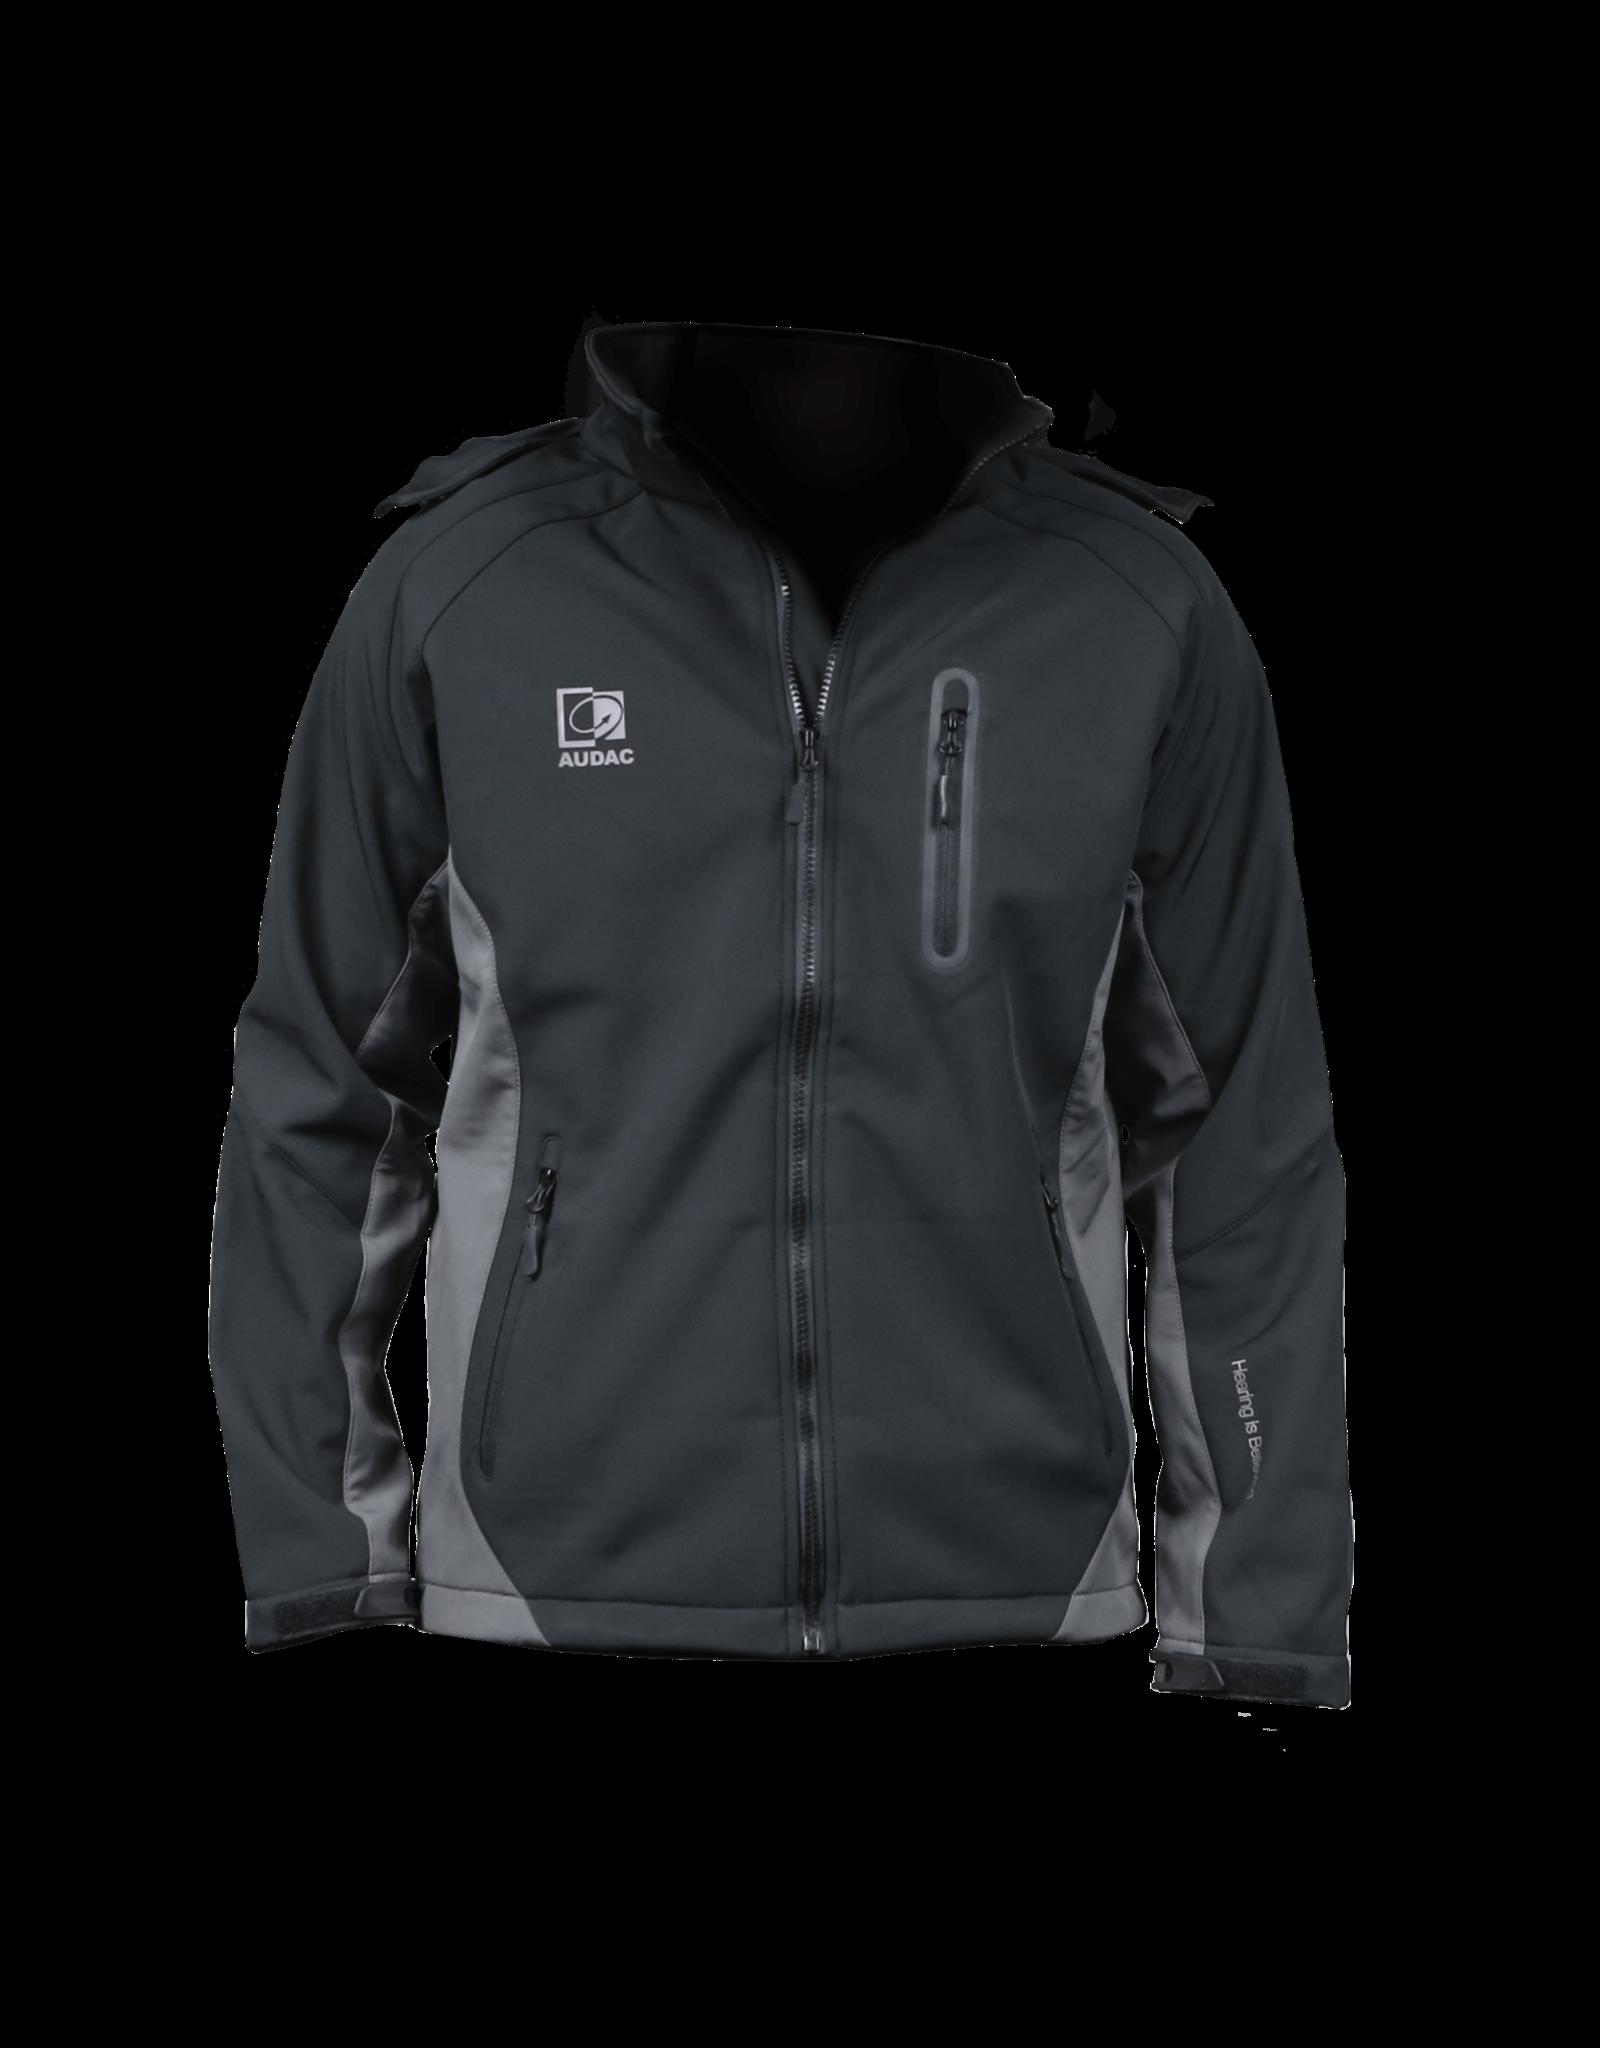 Audac AUDAC Softshell jacket MEDIUM